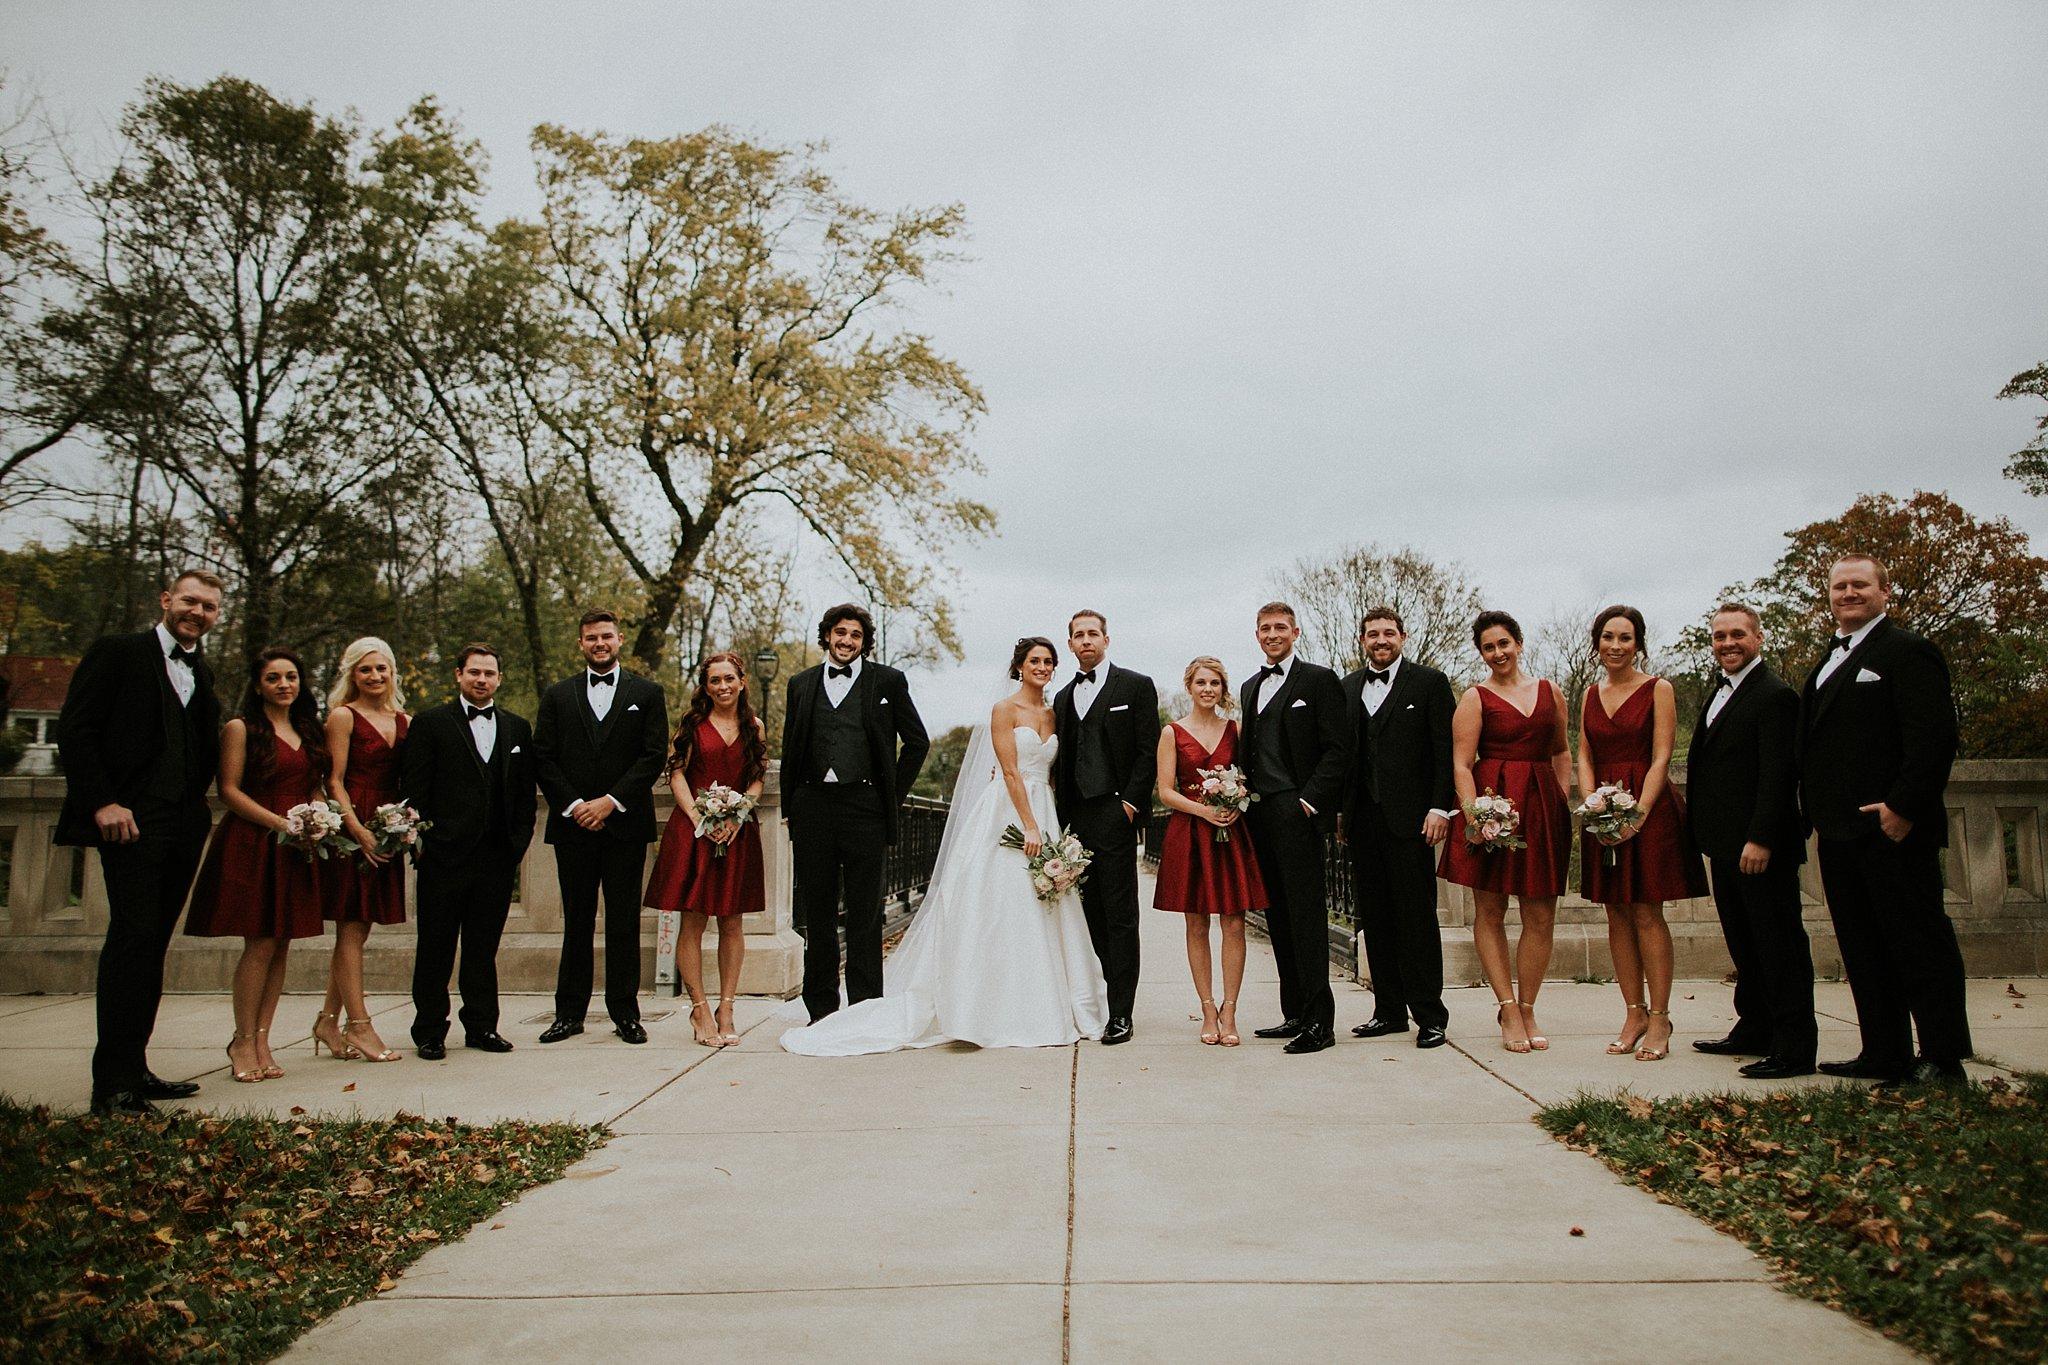 Matt-Lauren_St-Marys_Hilton-City-Center-Milwaukee-Wedding_liller-photo_0036.jpg